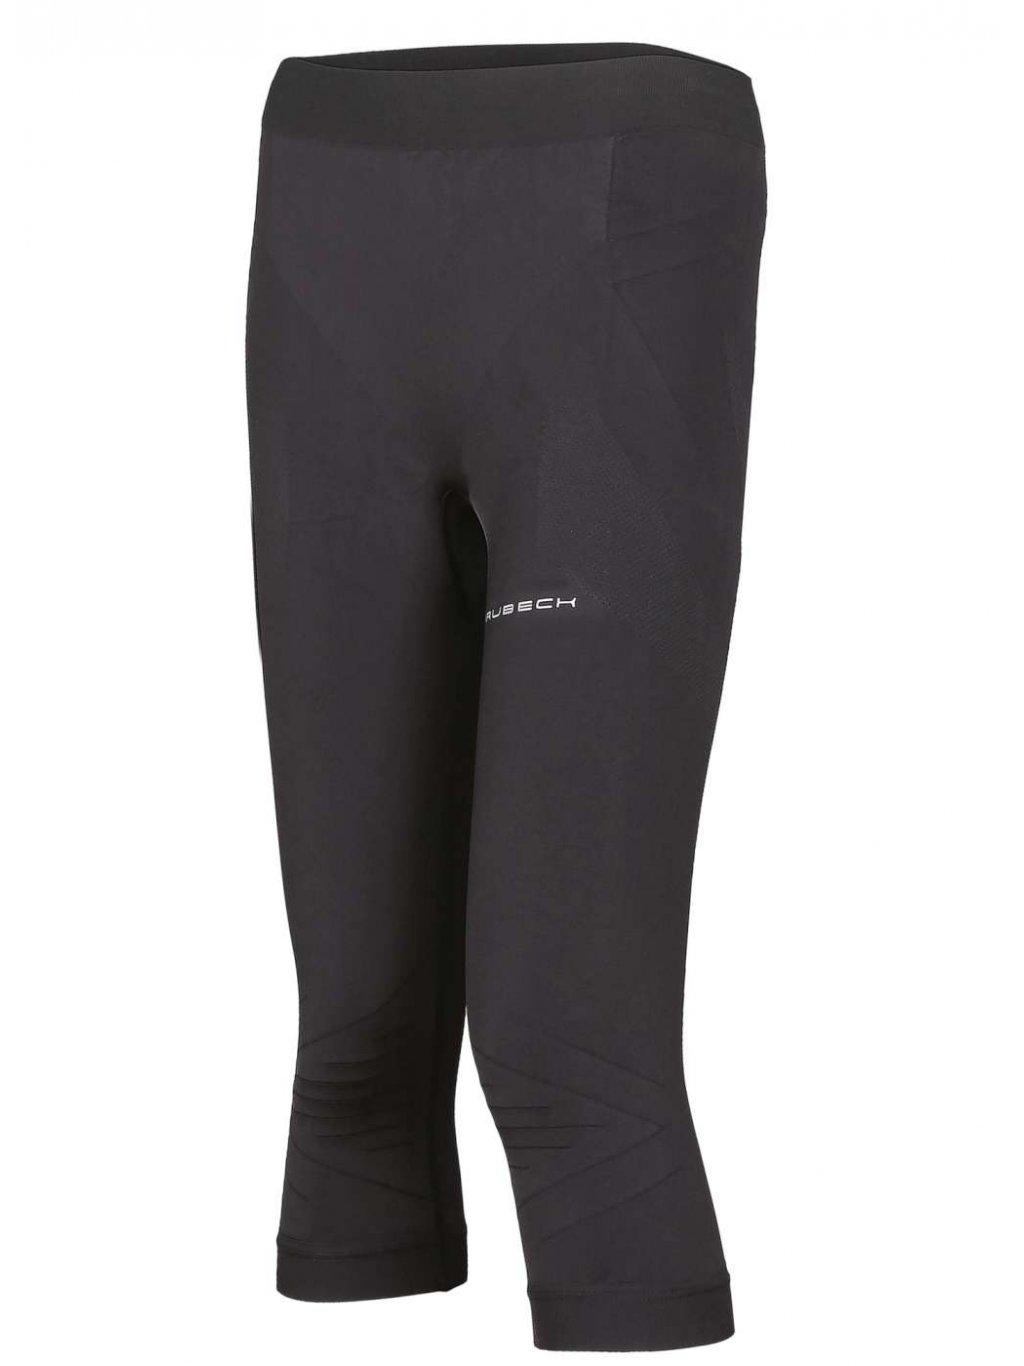 Brubeck dámské kalhoty 3/4 RUNNING FORCE Athletic